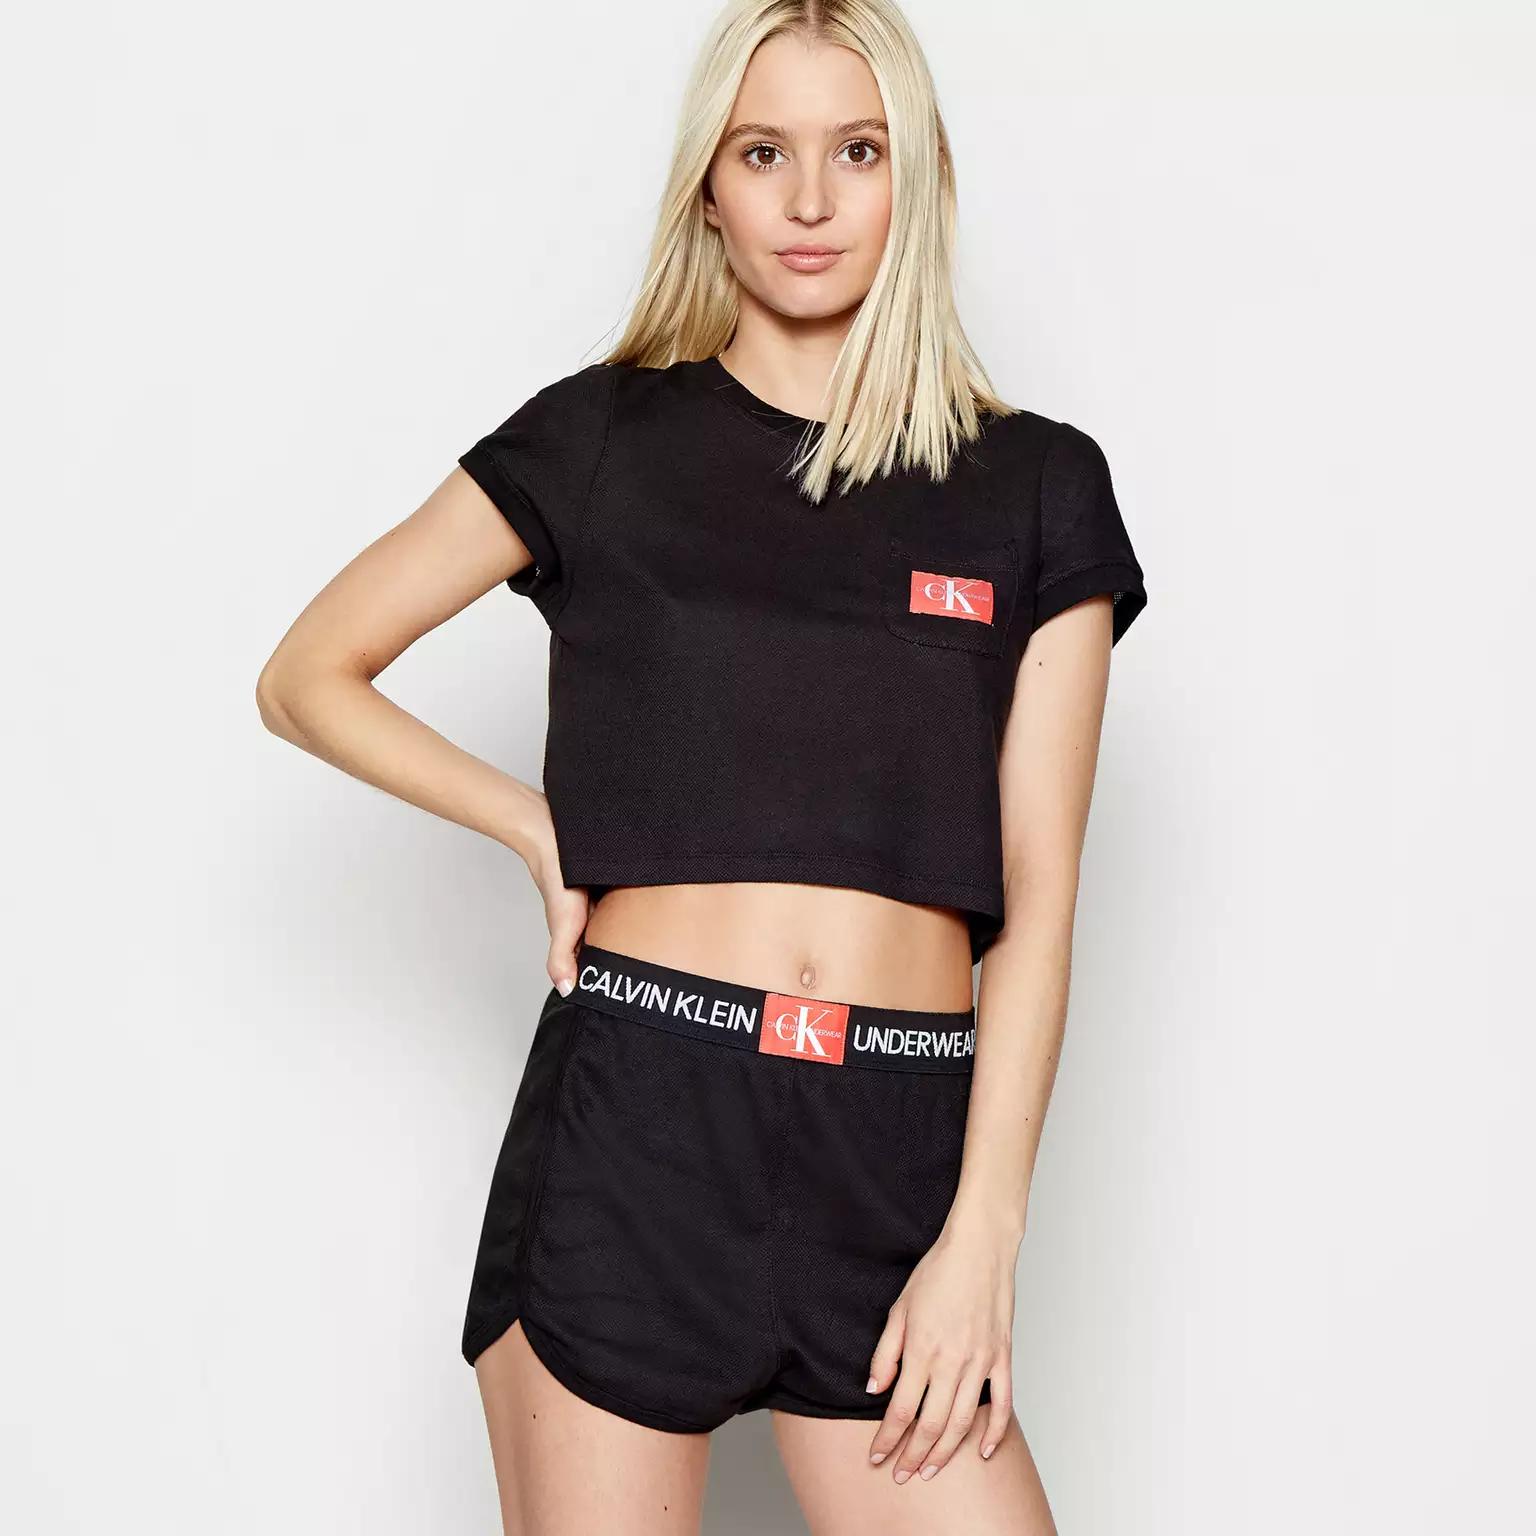 70% off Calvin Klein - Black & Grey Monogram Mesh Shorts at Debenhams. Was £40, now £12. Free C&C available.